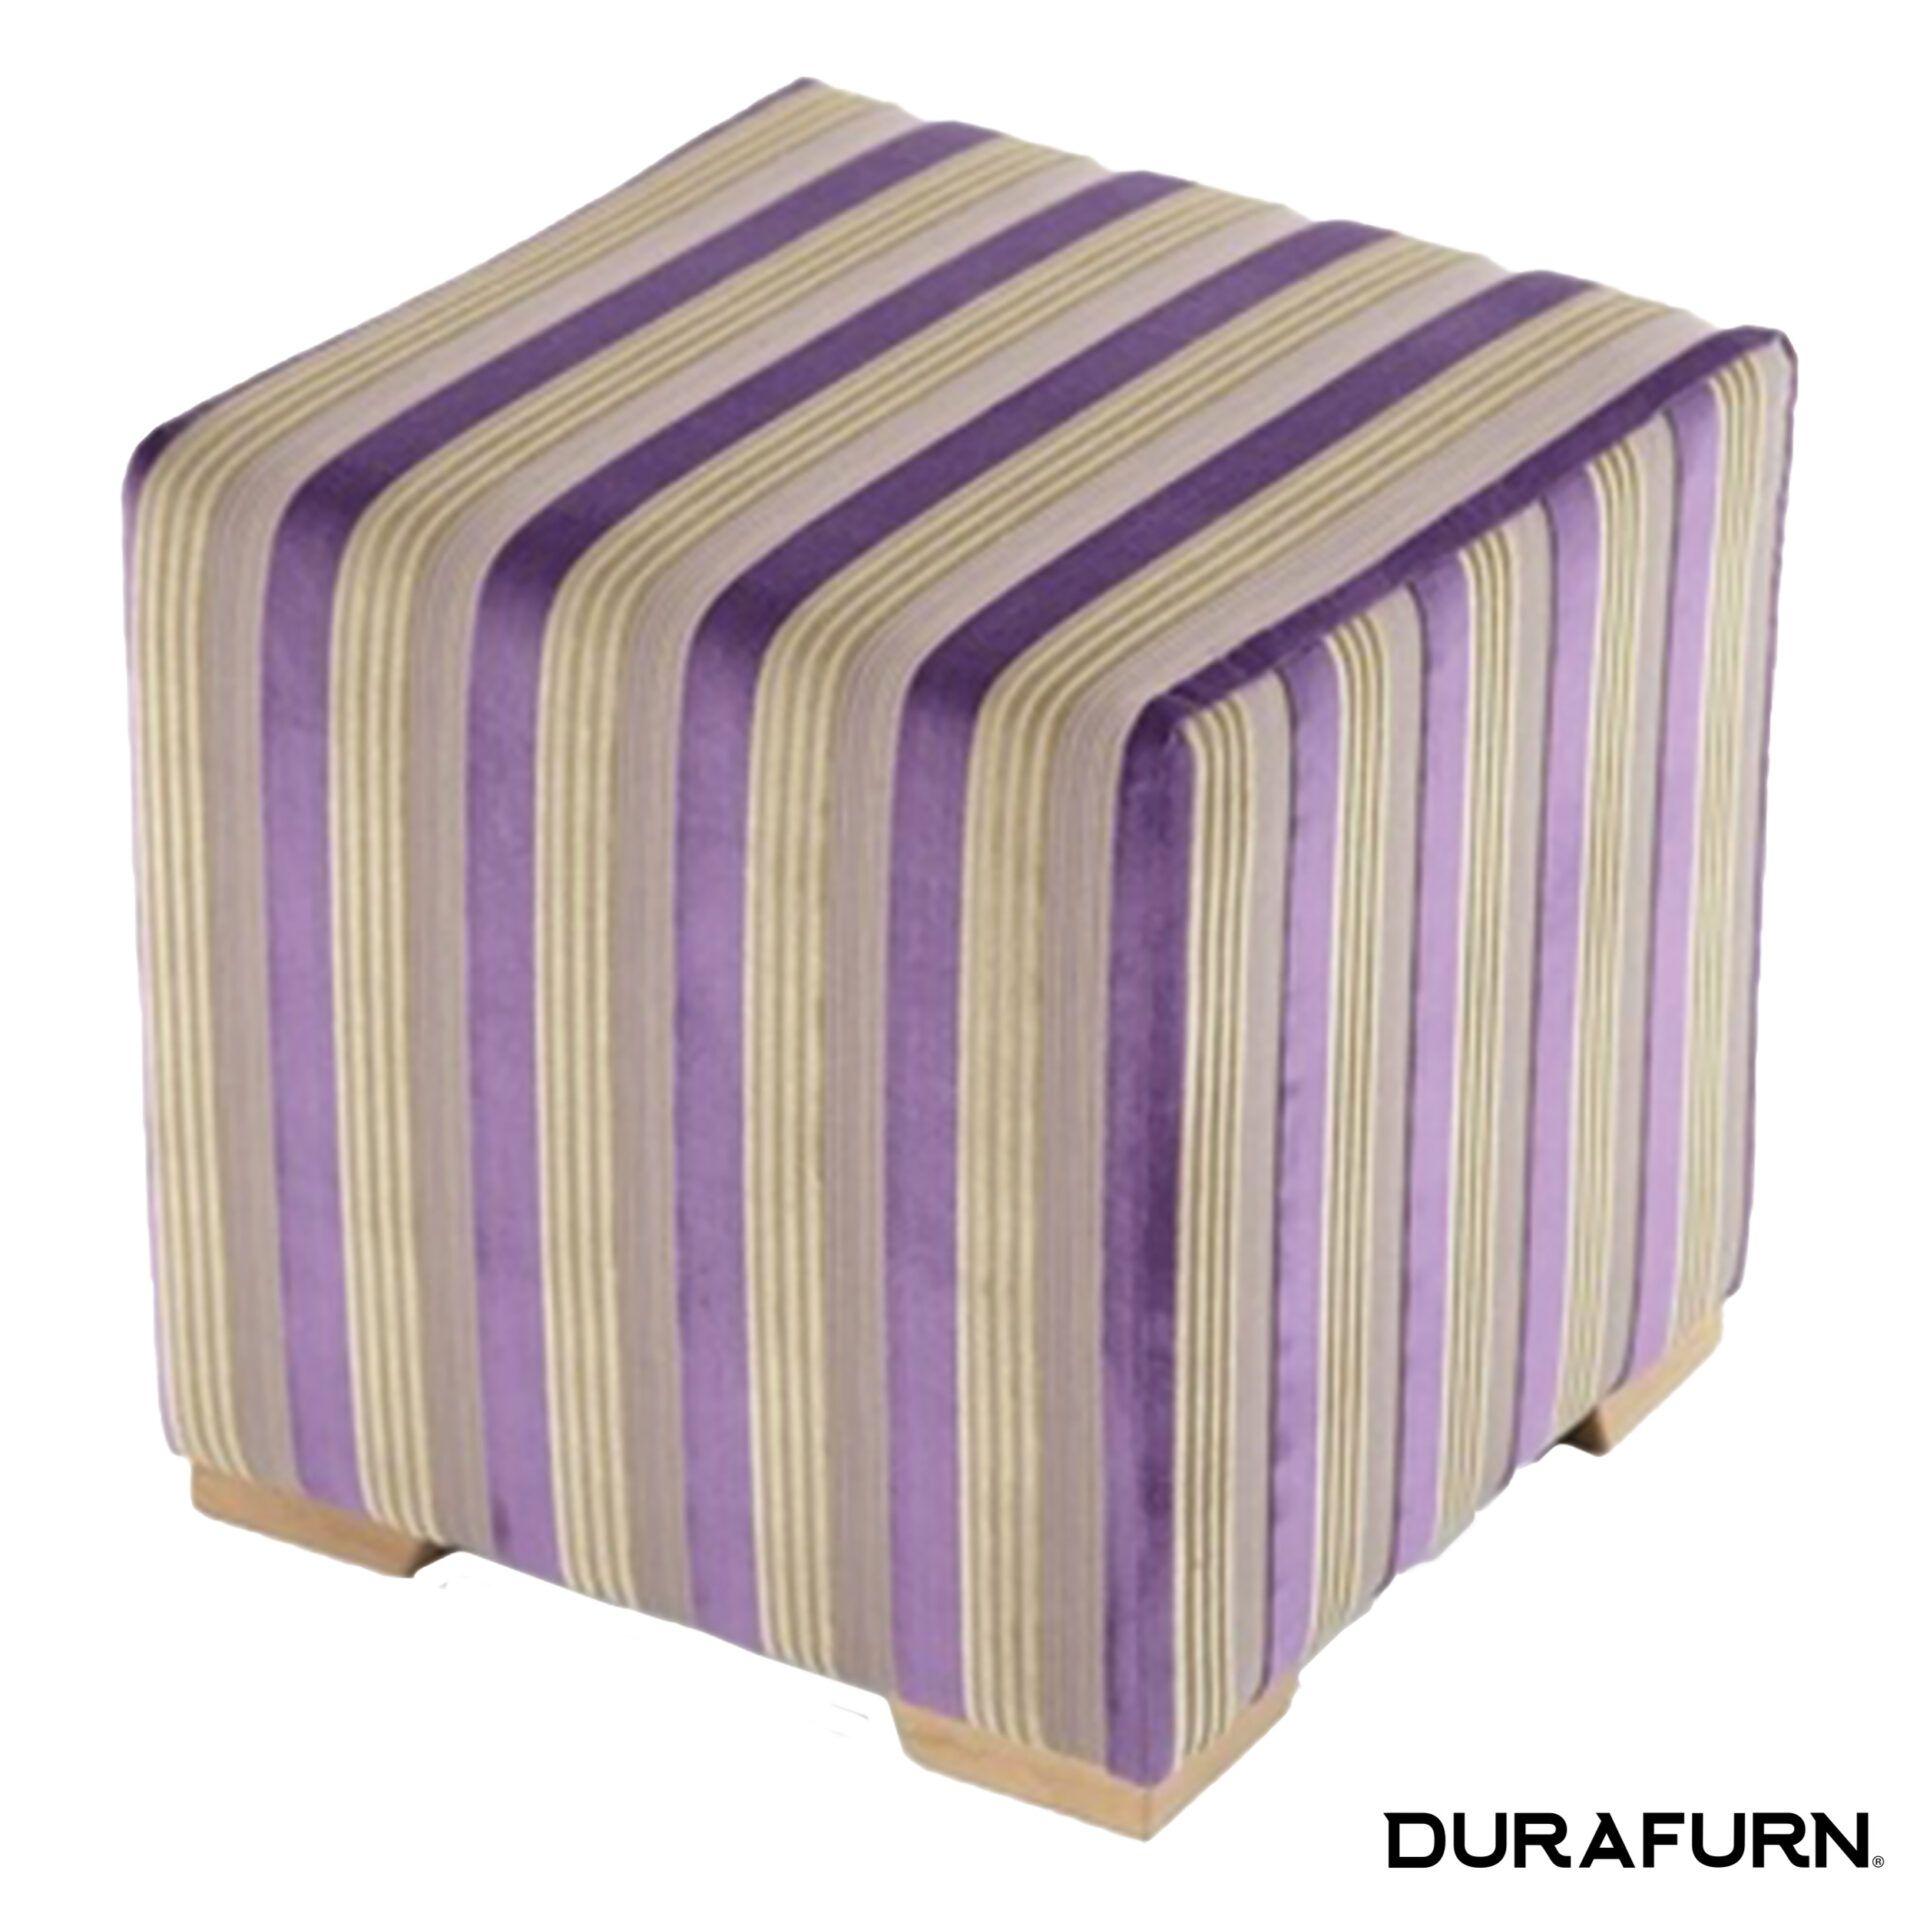 cubes.2500x2500